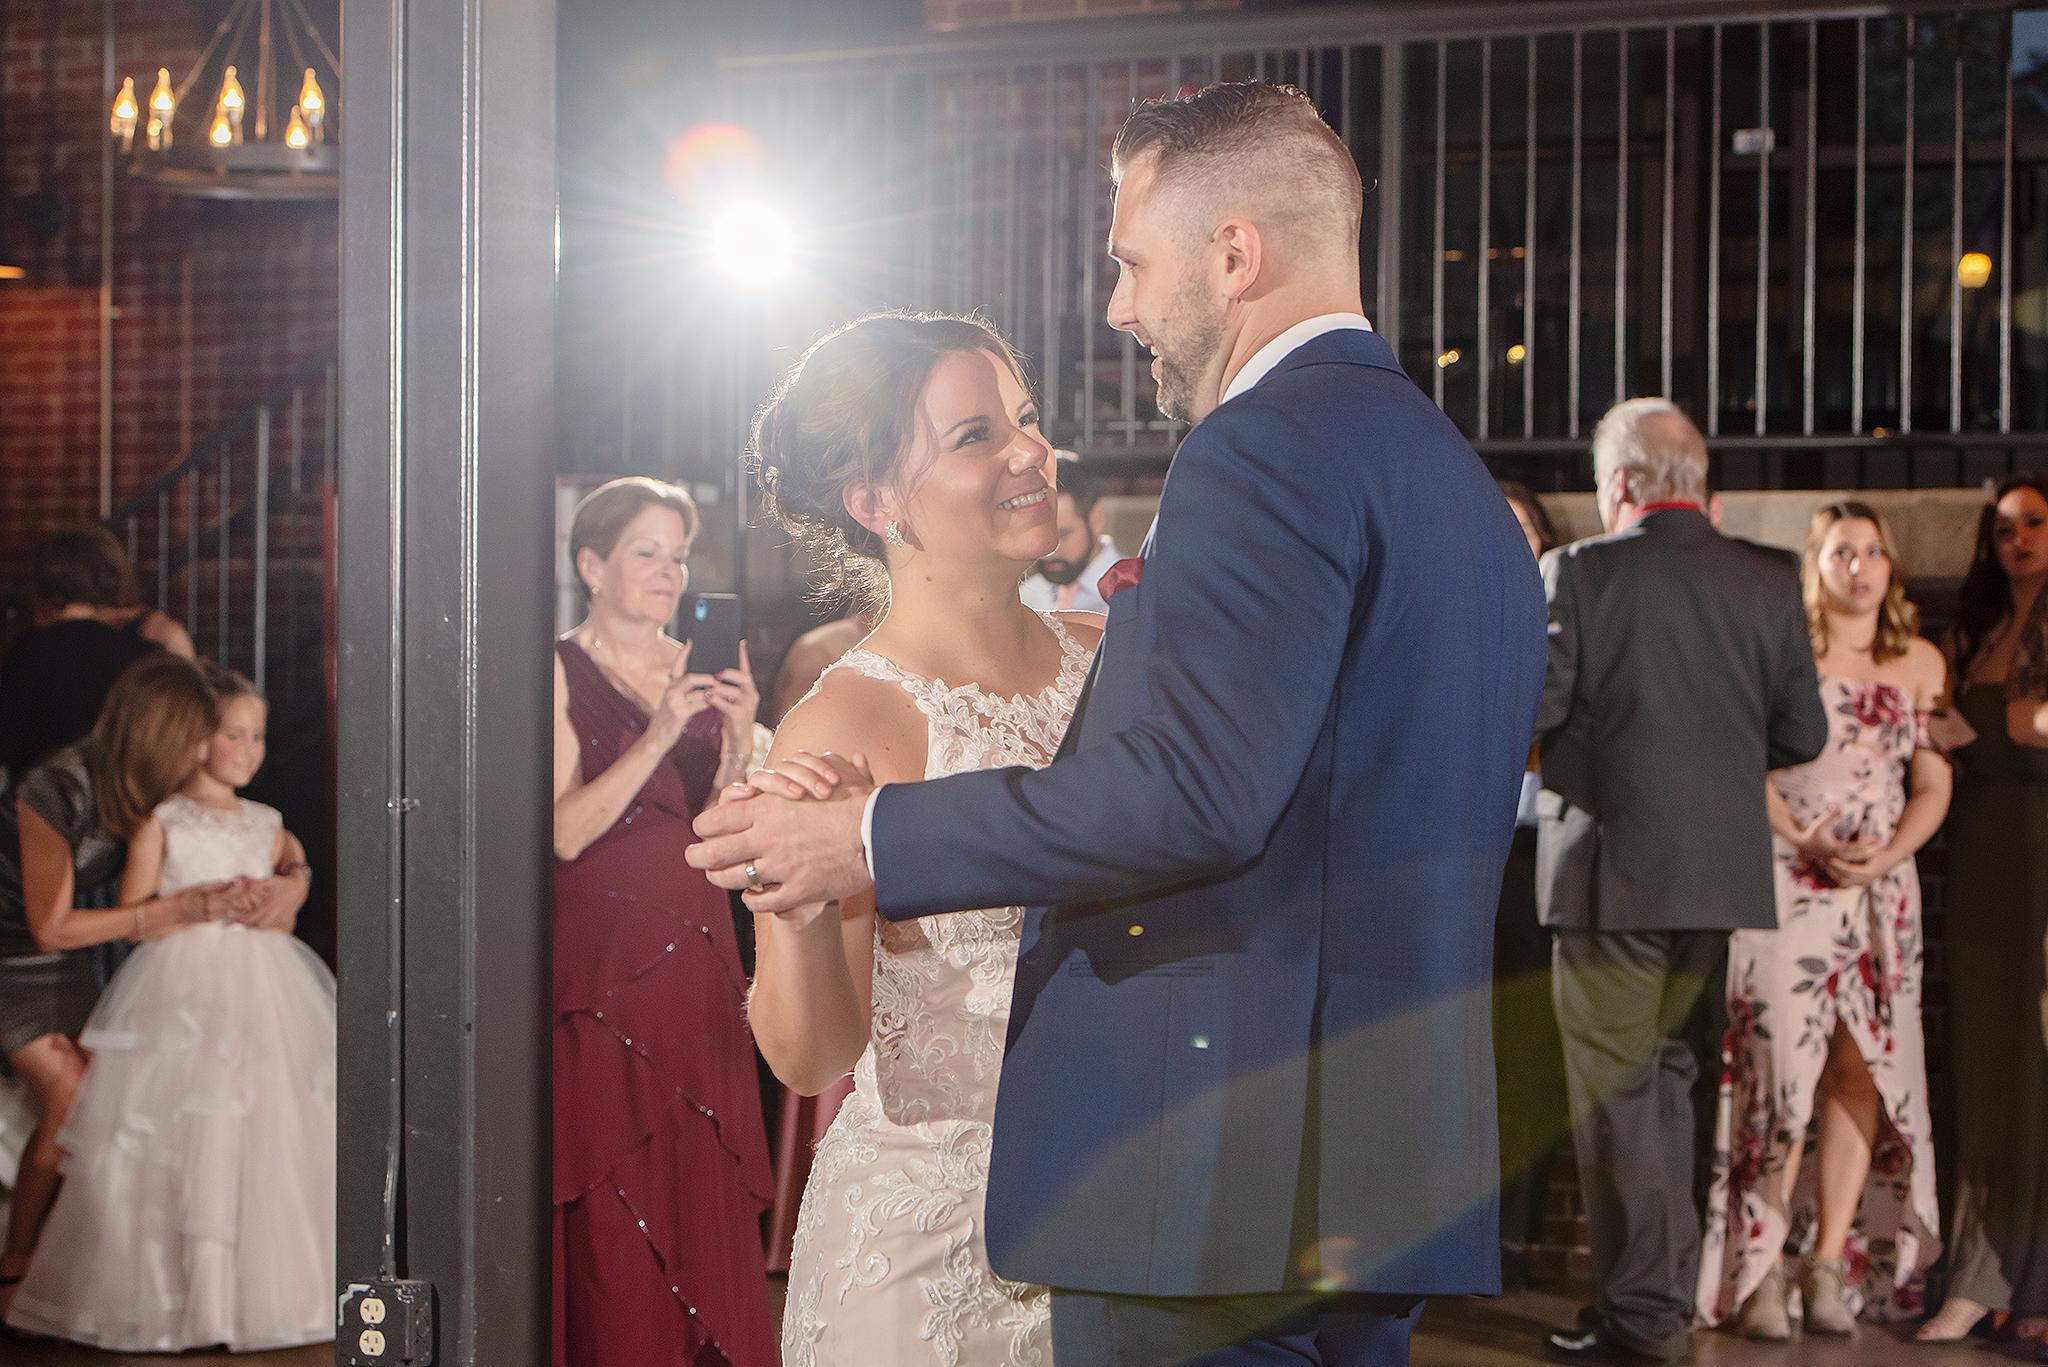 LINDSAY-ADKINS-PHOTOGRAPHY-MICHIGAN-WEDDING-PHOTOGRAPHER-FRANKENMUTH-BREWERY-WEDDING-MICHIGAN-BLOG-31